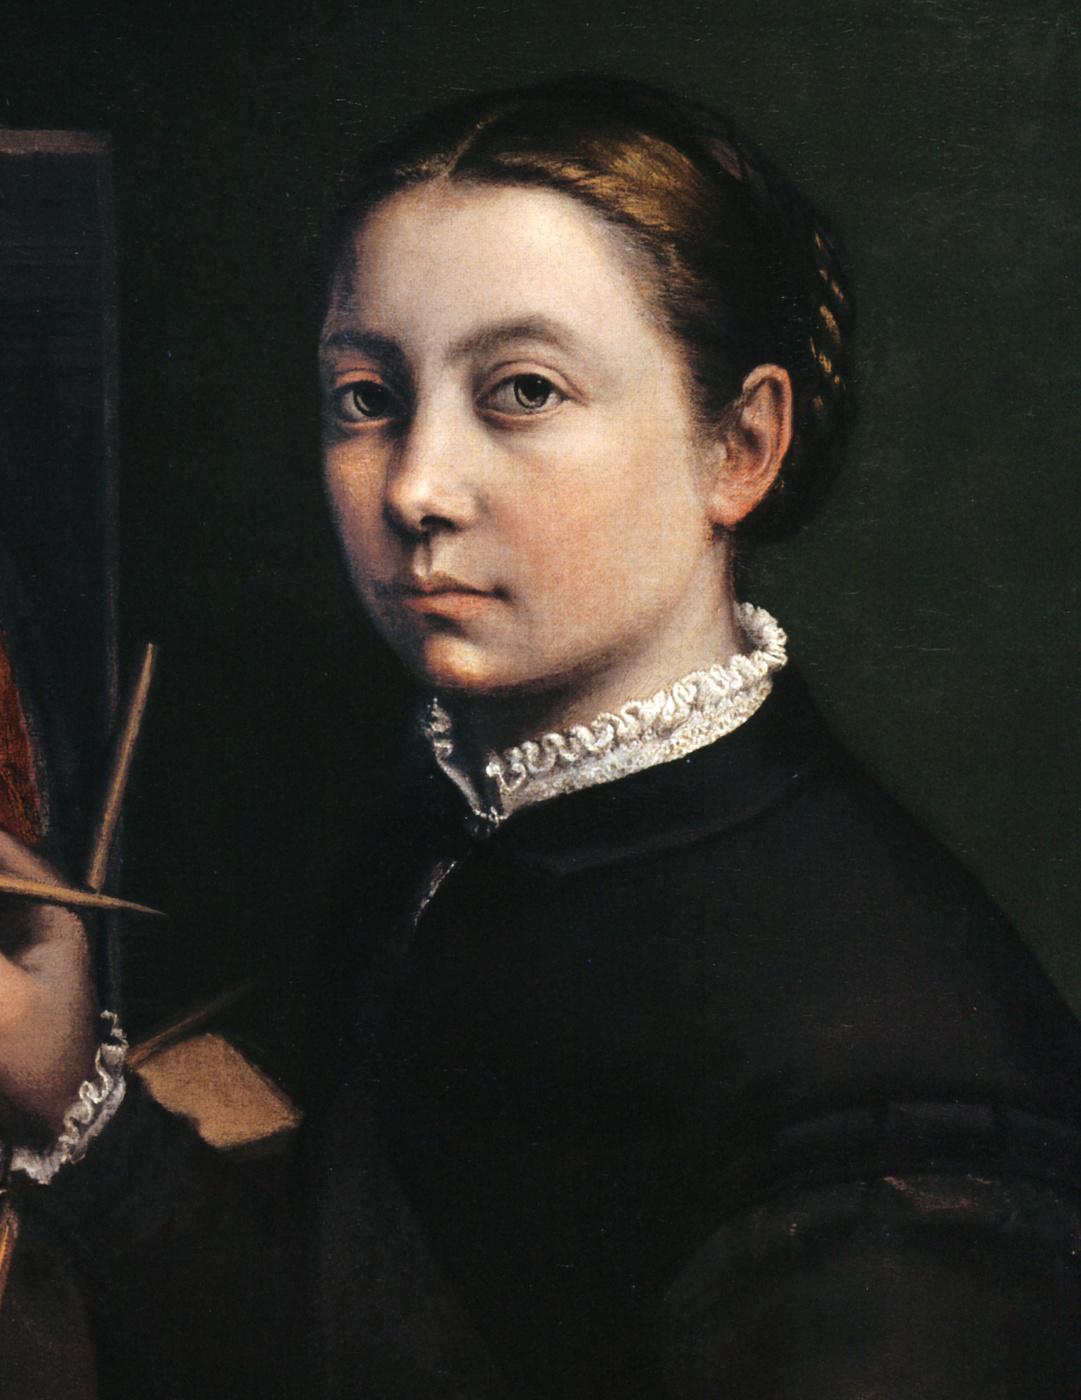 Sofonisba Anguissola. Self-portrait near the easel